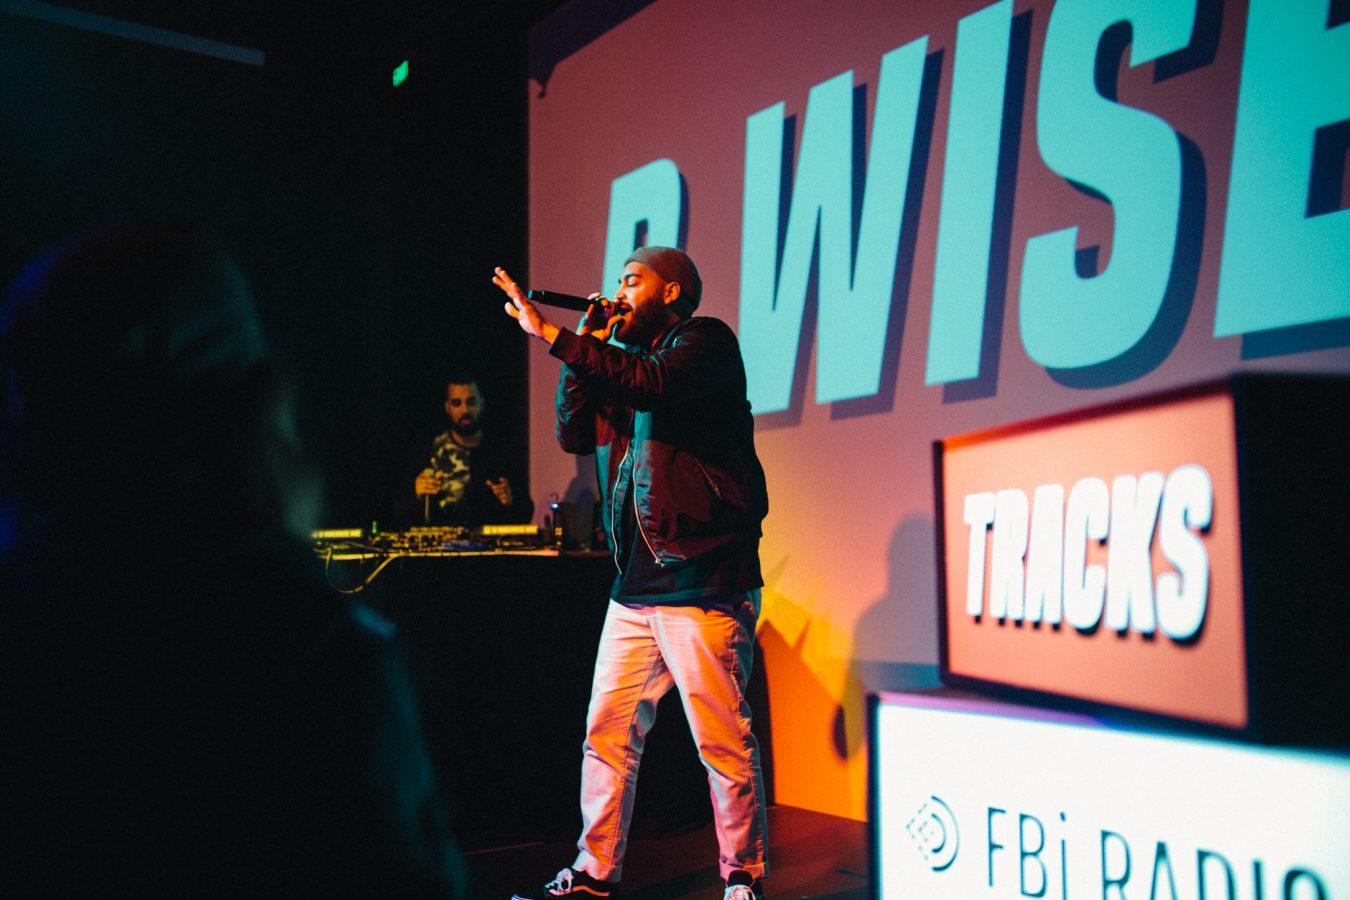 FBi Radio presents TRACKS at Blacktown Arts Centre